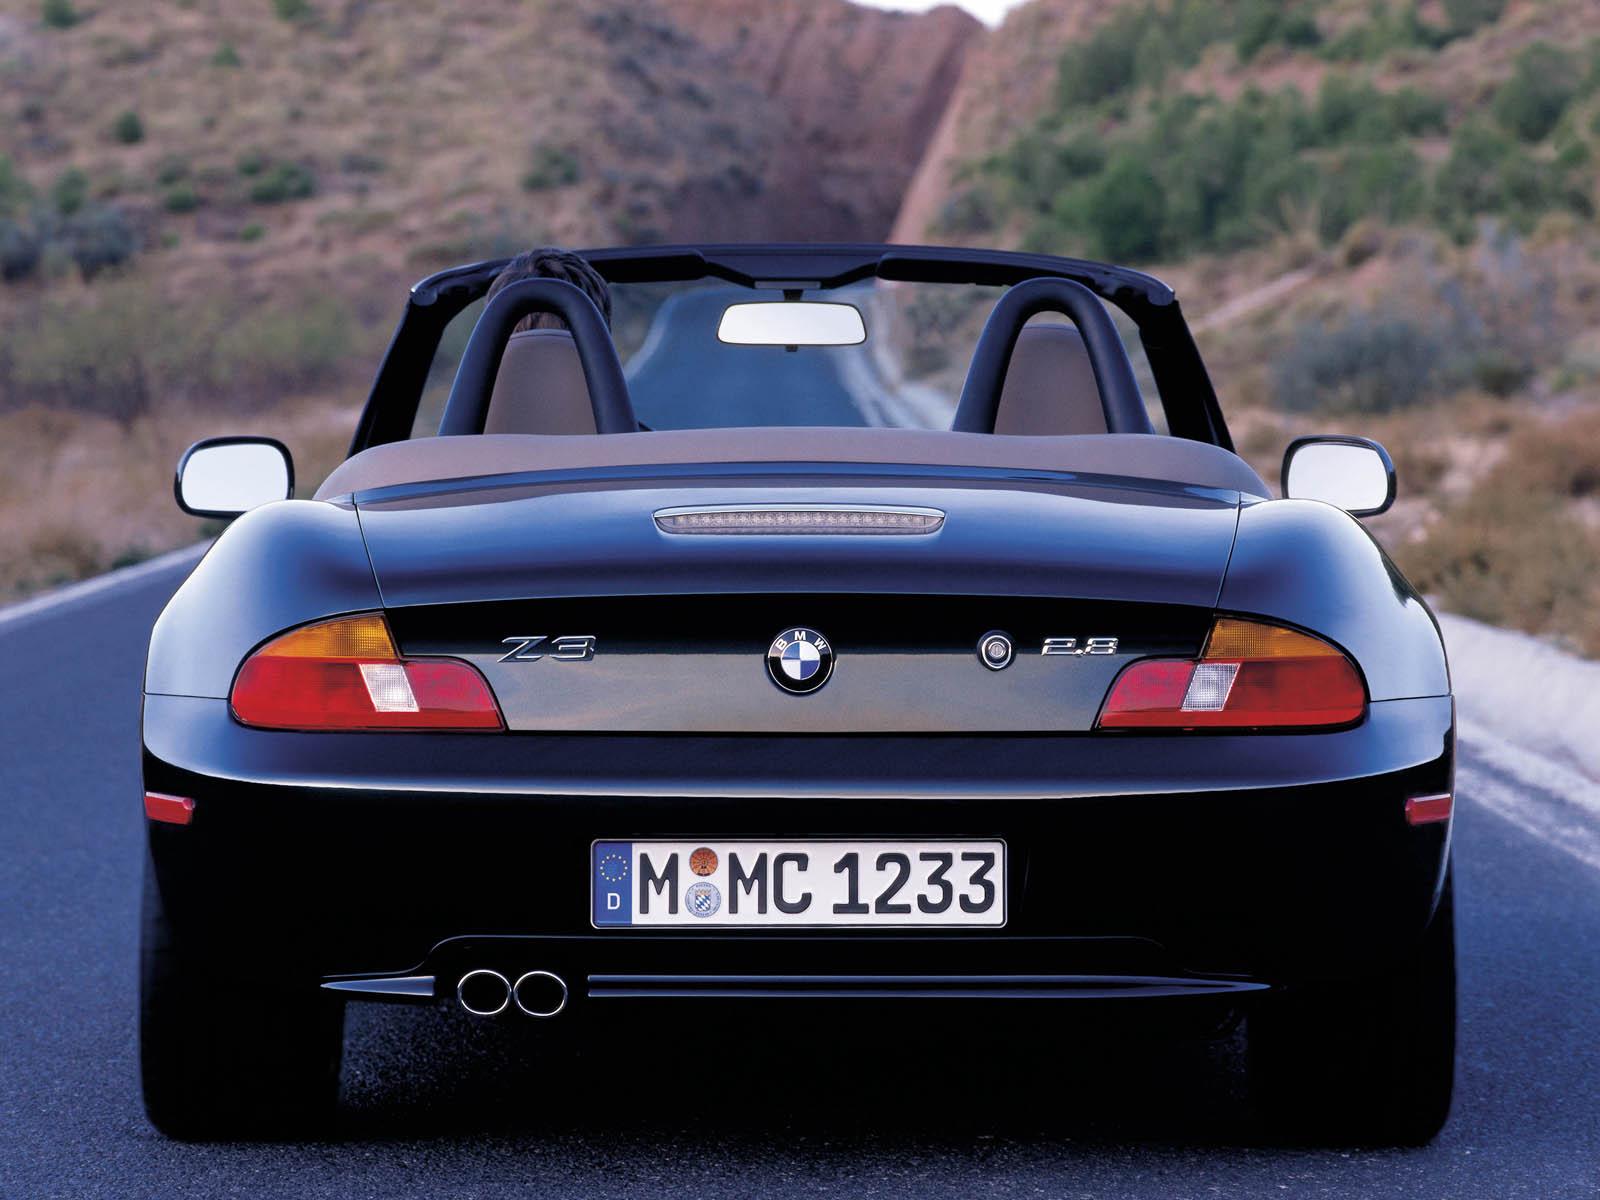 BMW-Z3-Roadster-004.jpg